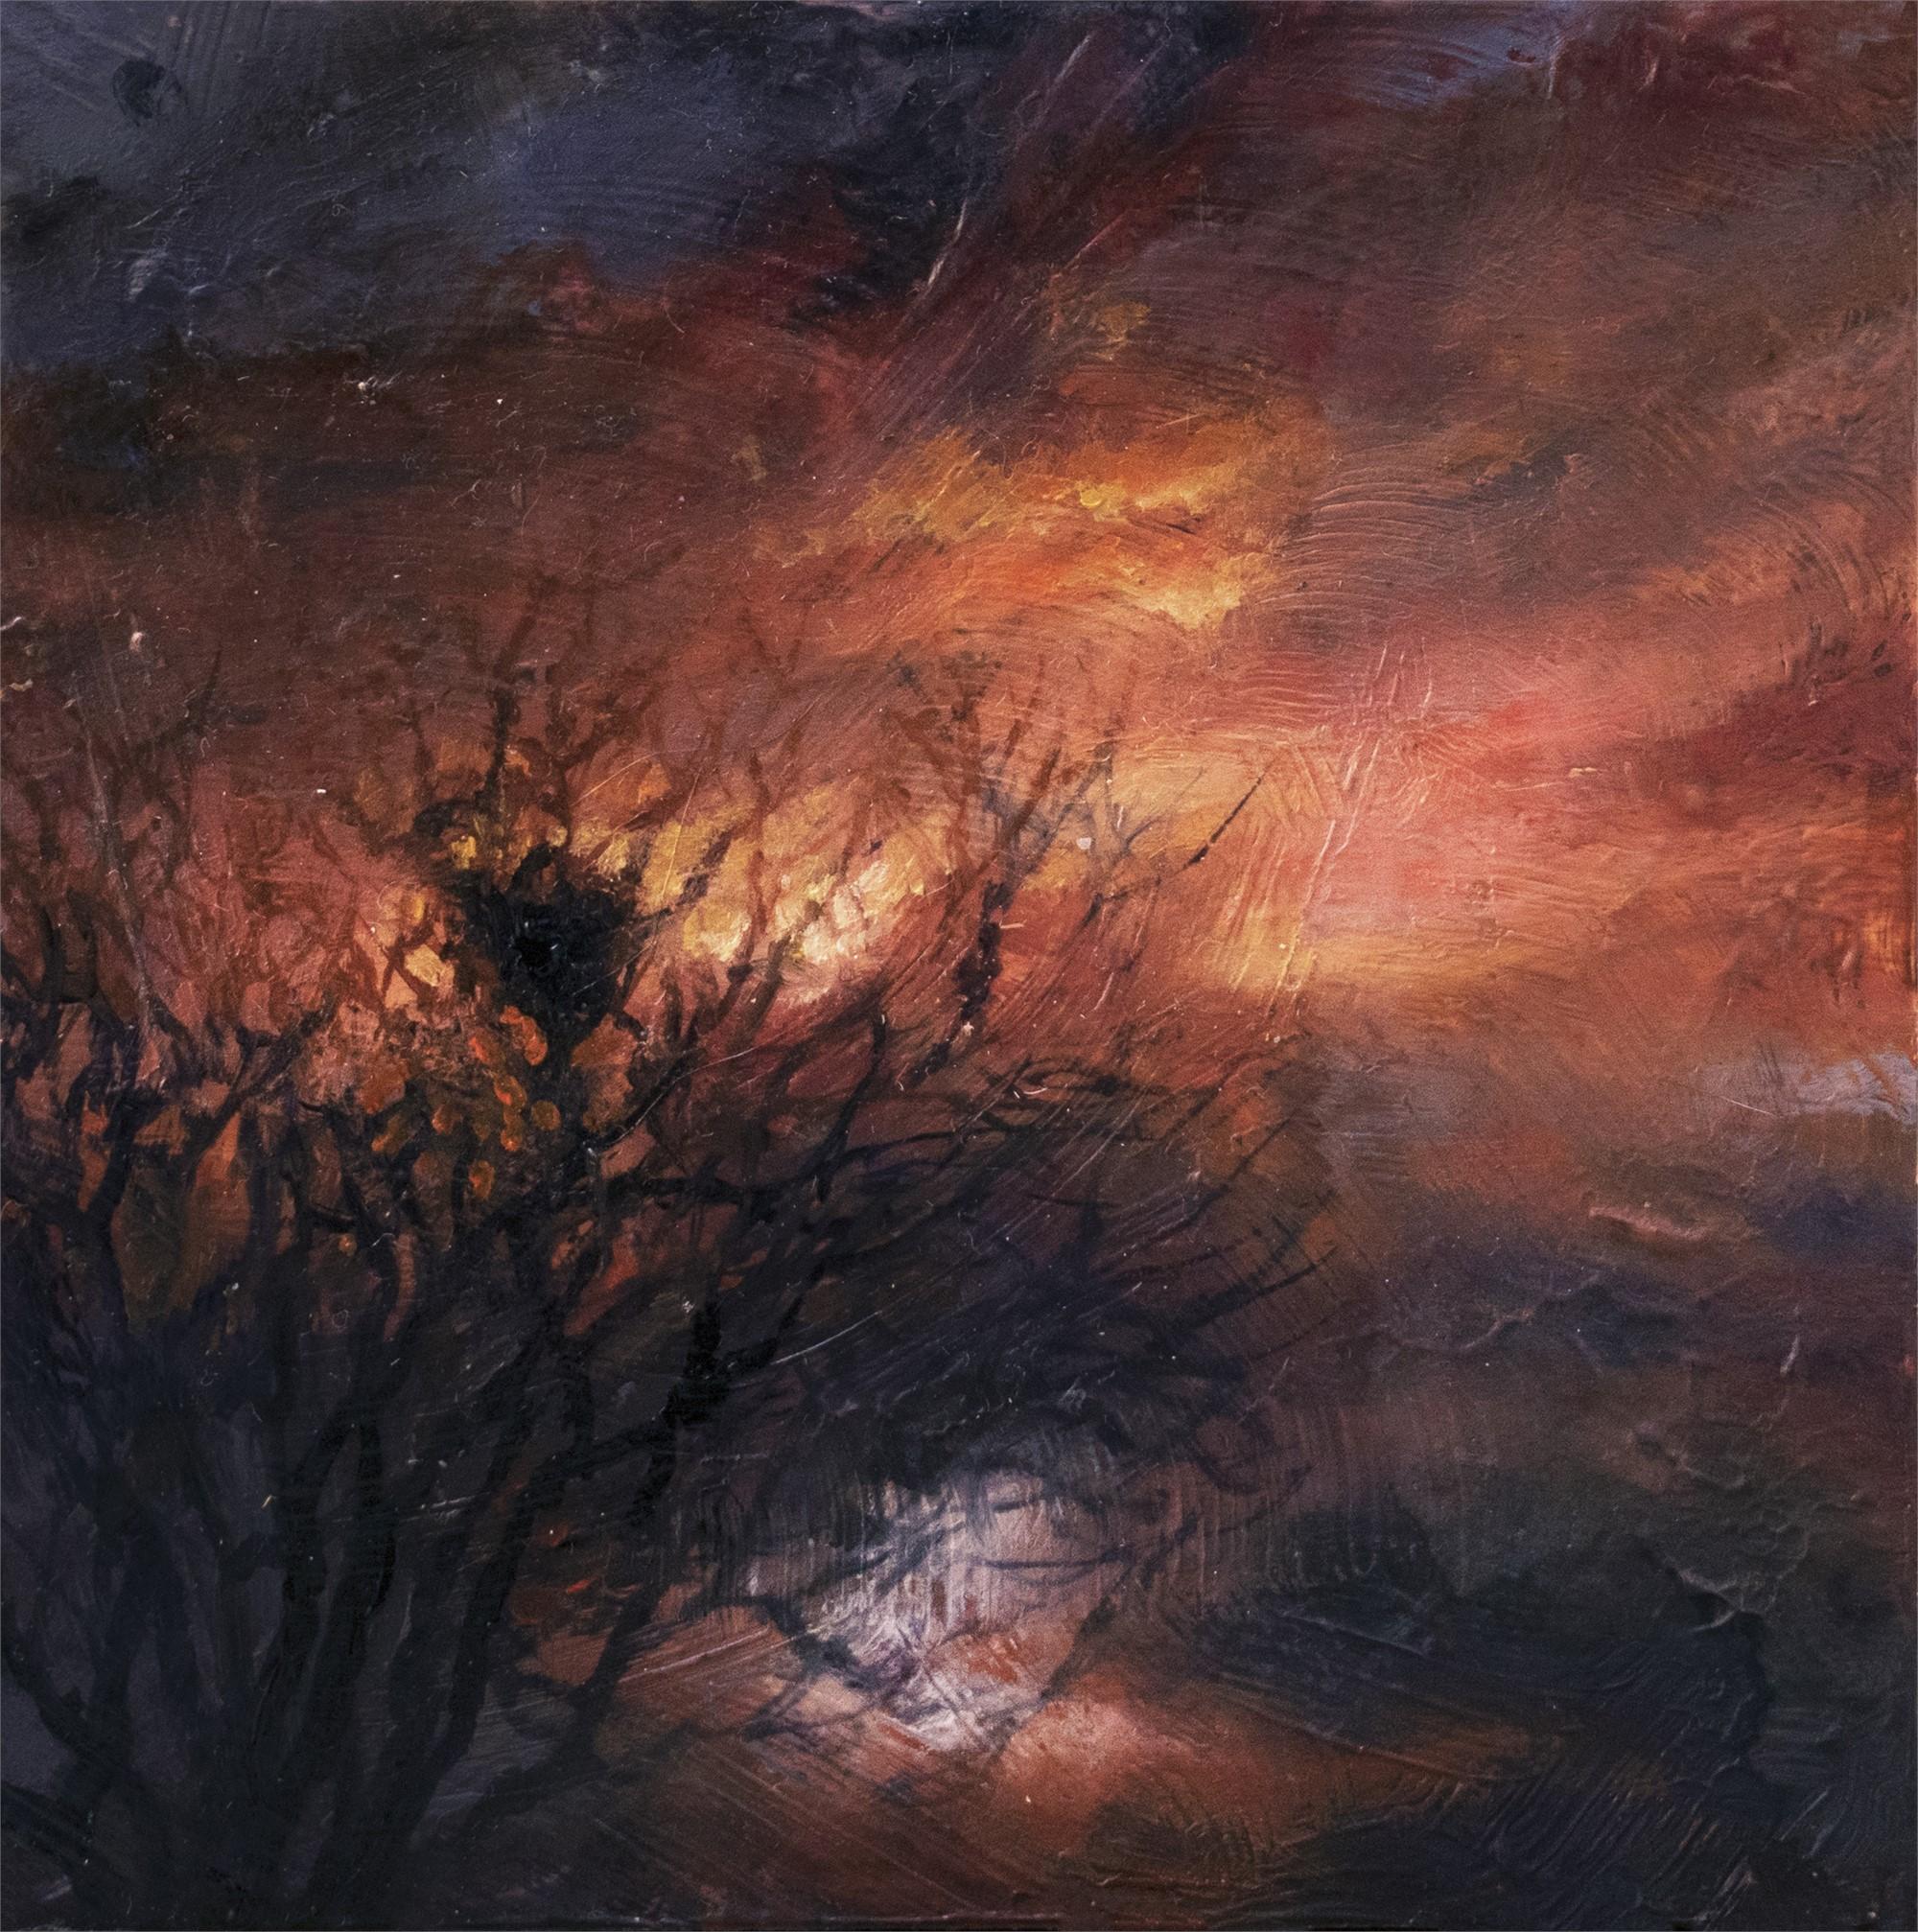 Nest by Adam Burke